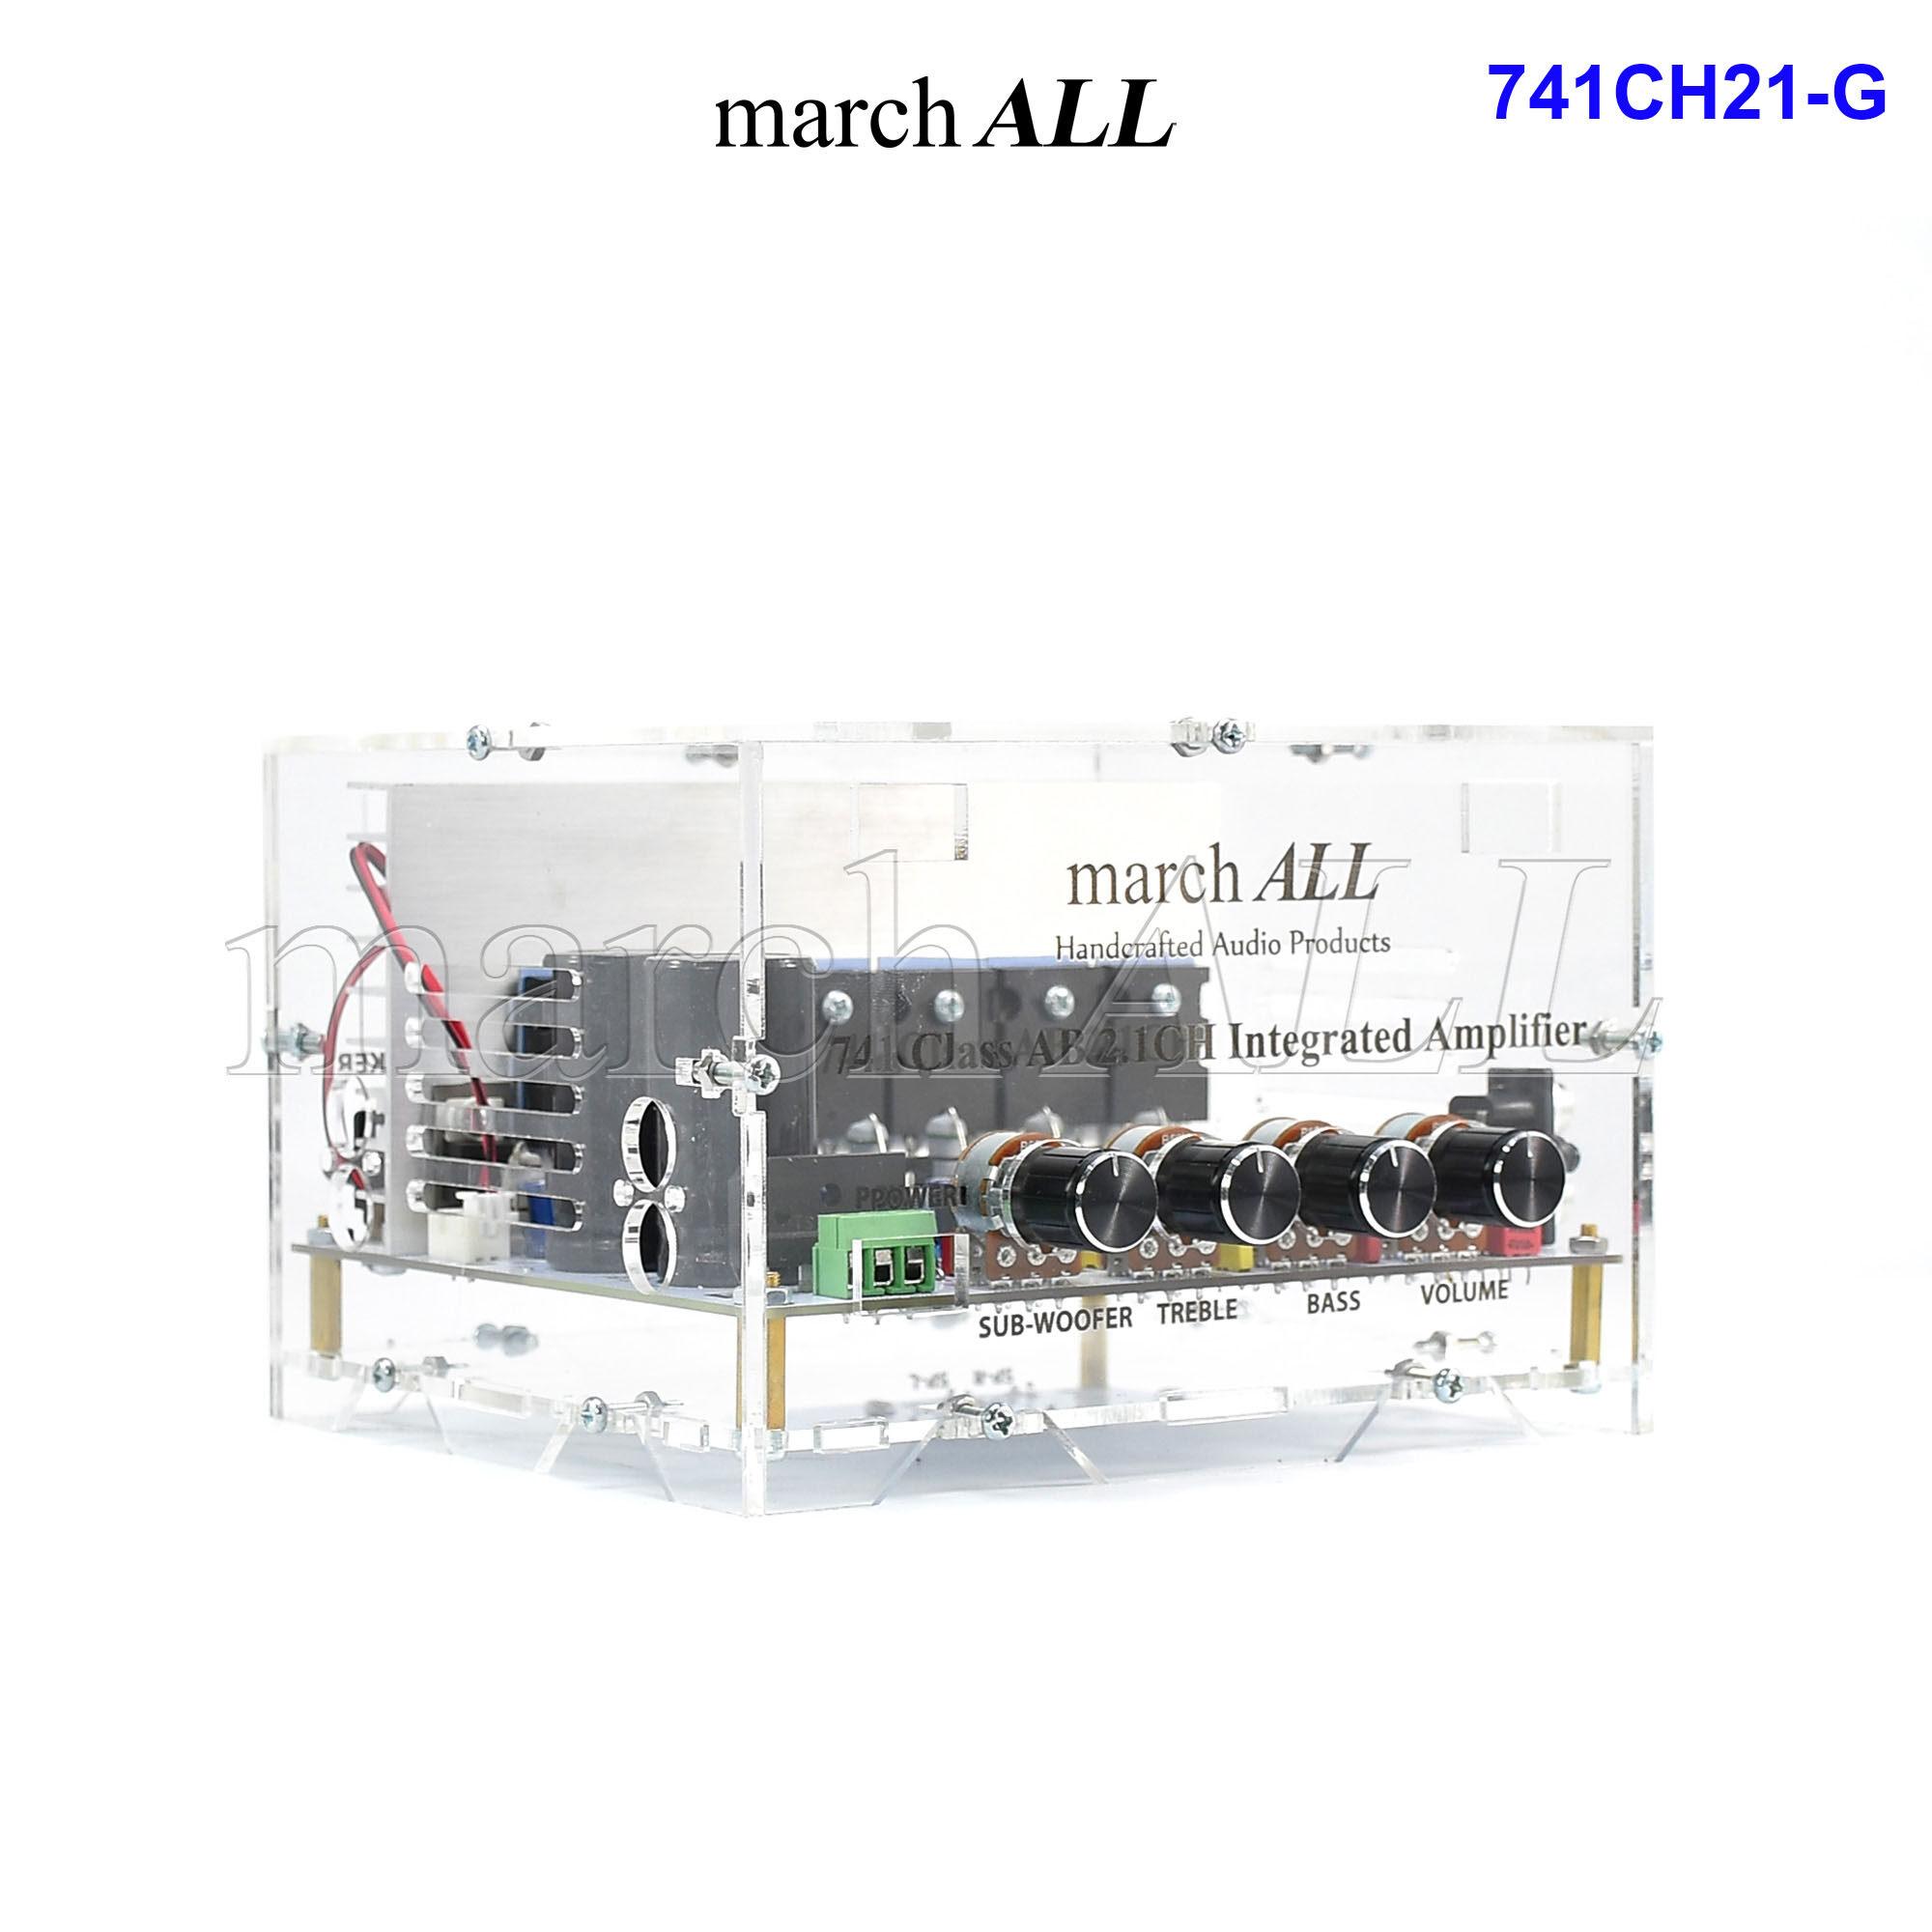 Marchall 741ch21-G ชุดลงเคสใส 741 Amp บอร์ดแอมป์ 2.1 Channel + ซับเบส มีปรีแอมป์ โทน คอนโทรล ปรับทุ้ม แหลม ปรับ ซับวูฟเฟอร์ ได้อิสระ Toshiba ทรานซิสเตอร์ 6 ตัว ซิงค์ พร้อม พัดลม แจ็ค Jack ครบ ต่อลำโพงใช้ได้เลย 741 Class-Ab Integrated Amplifier Subwoofer.